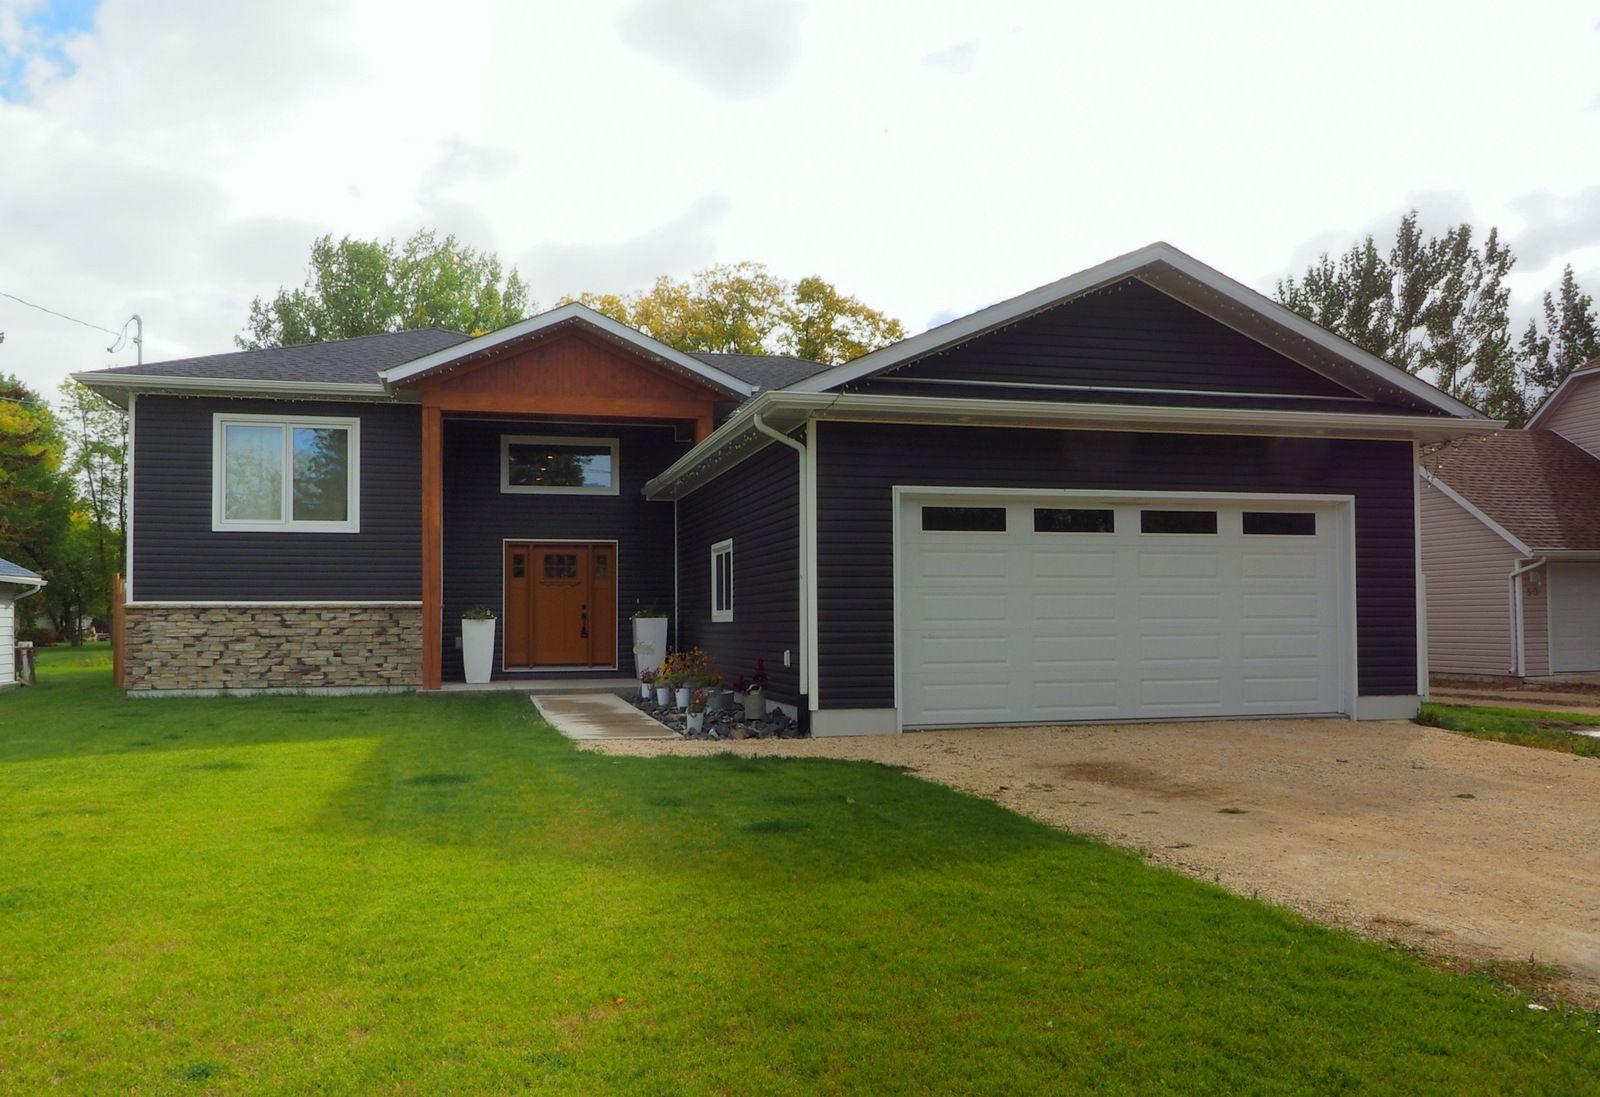 Main Photo: 56 Wilson Street in Portage la Prairie RM: House for sale : MLS®# 202107716